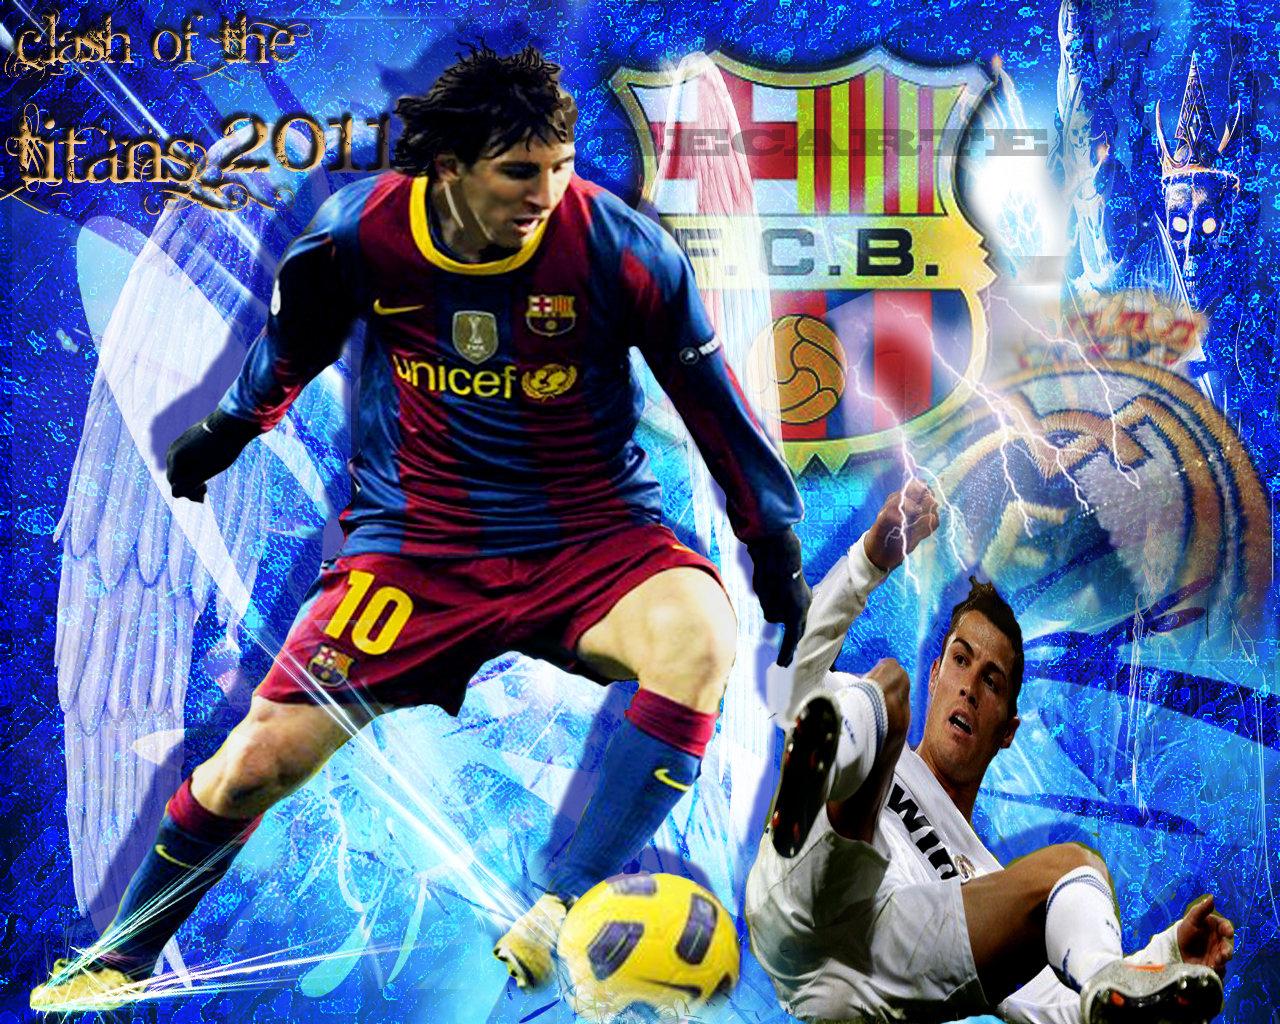 http://2.bp.blogspot.com/-ARTW63rmnBI/TeJHlxQpp9I/AAAAAAAAEgY/64VtF6I0rHo/s1600/barcelona_vs_real_madrid_2011_fc_barcelona.jpg